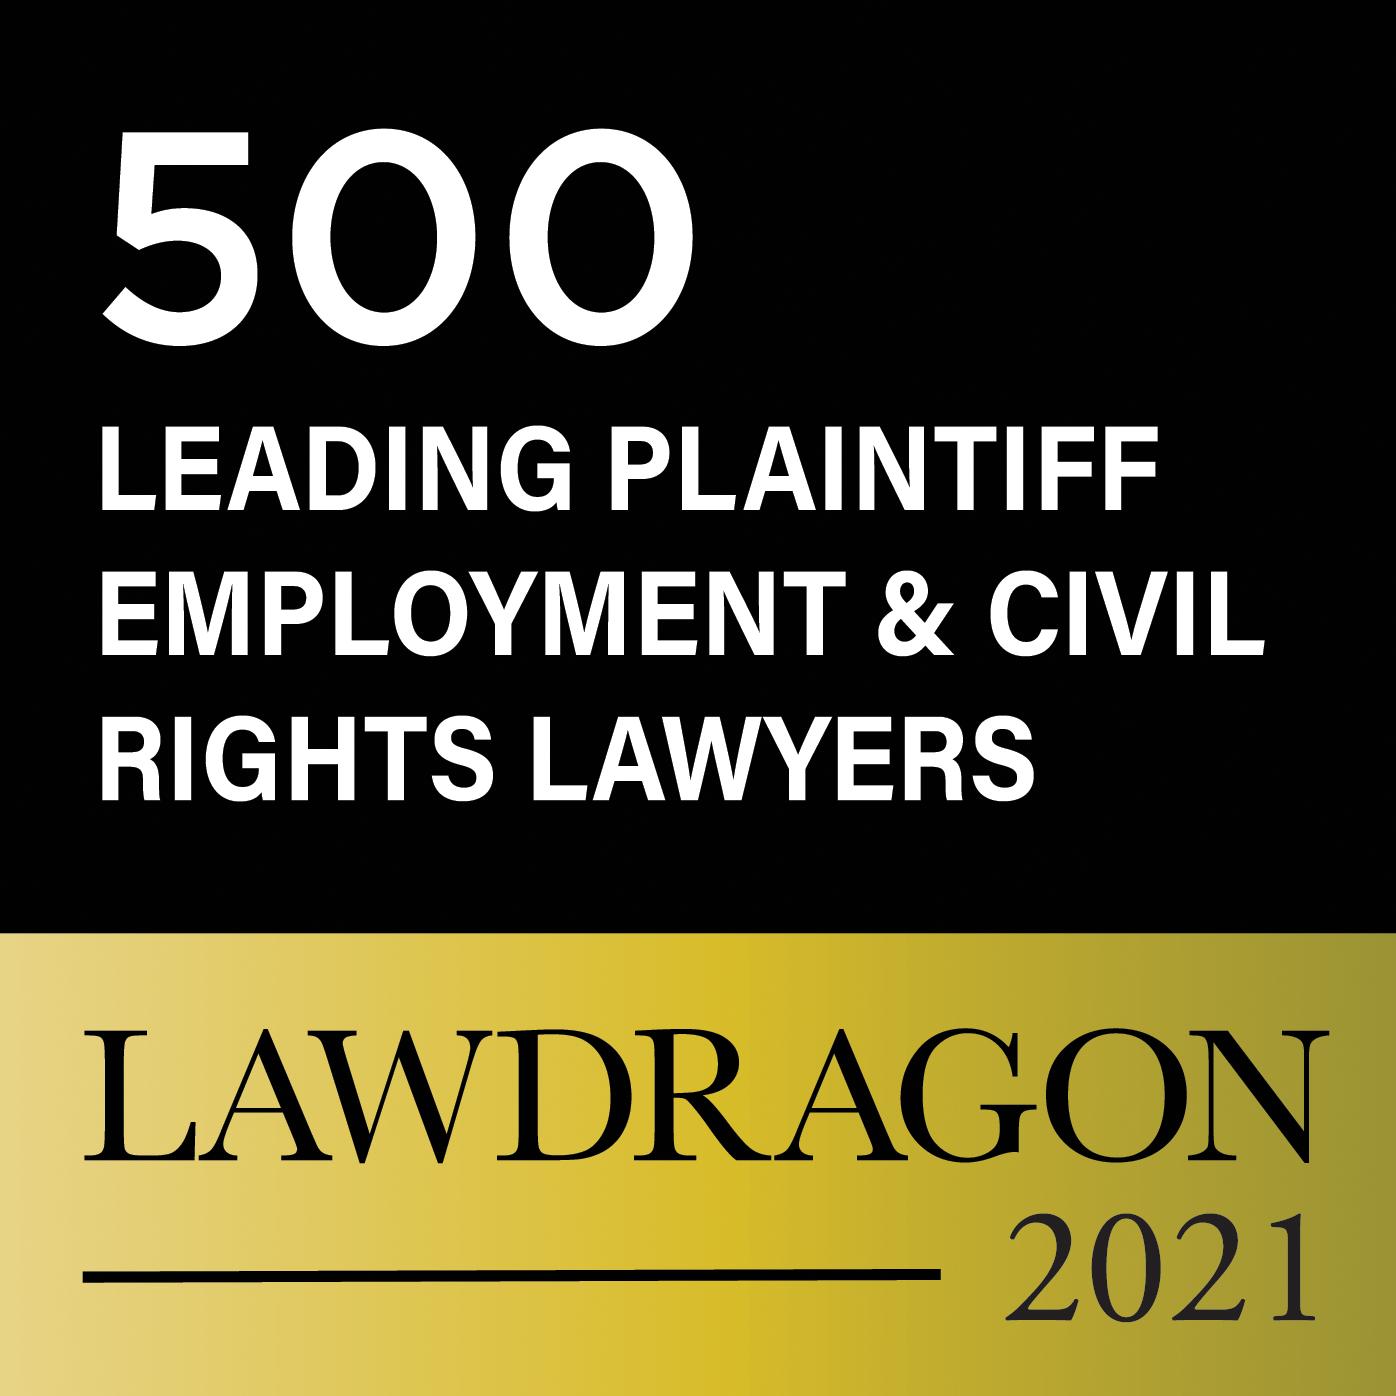 Lawdragon 2021 - 500 Leading Plaintiff Employment & Civil Rights Lawyers